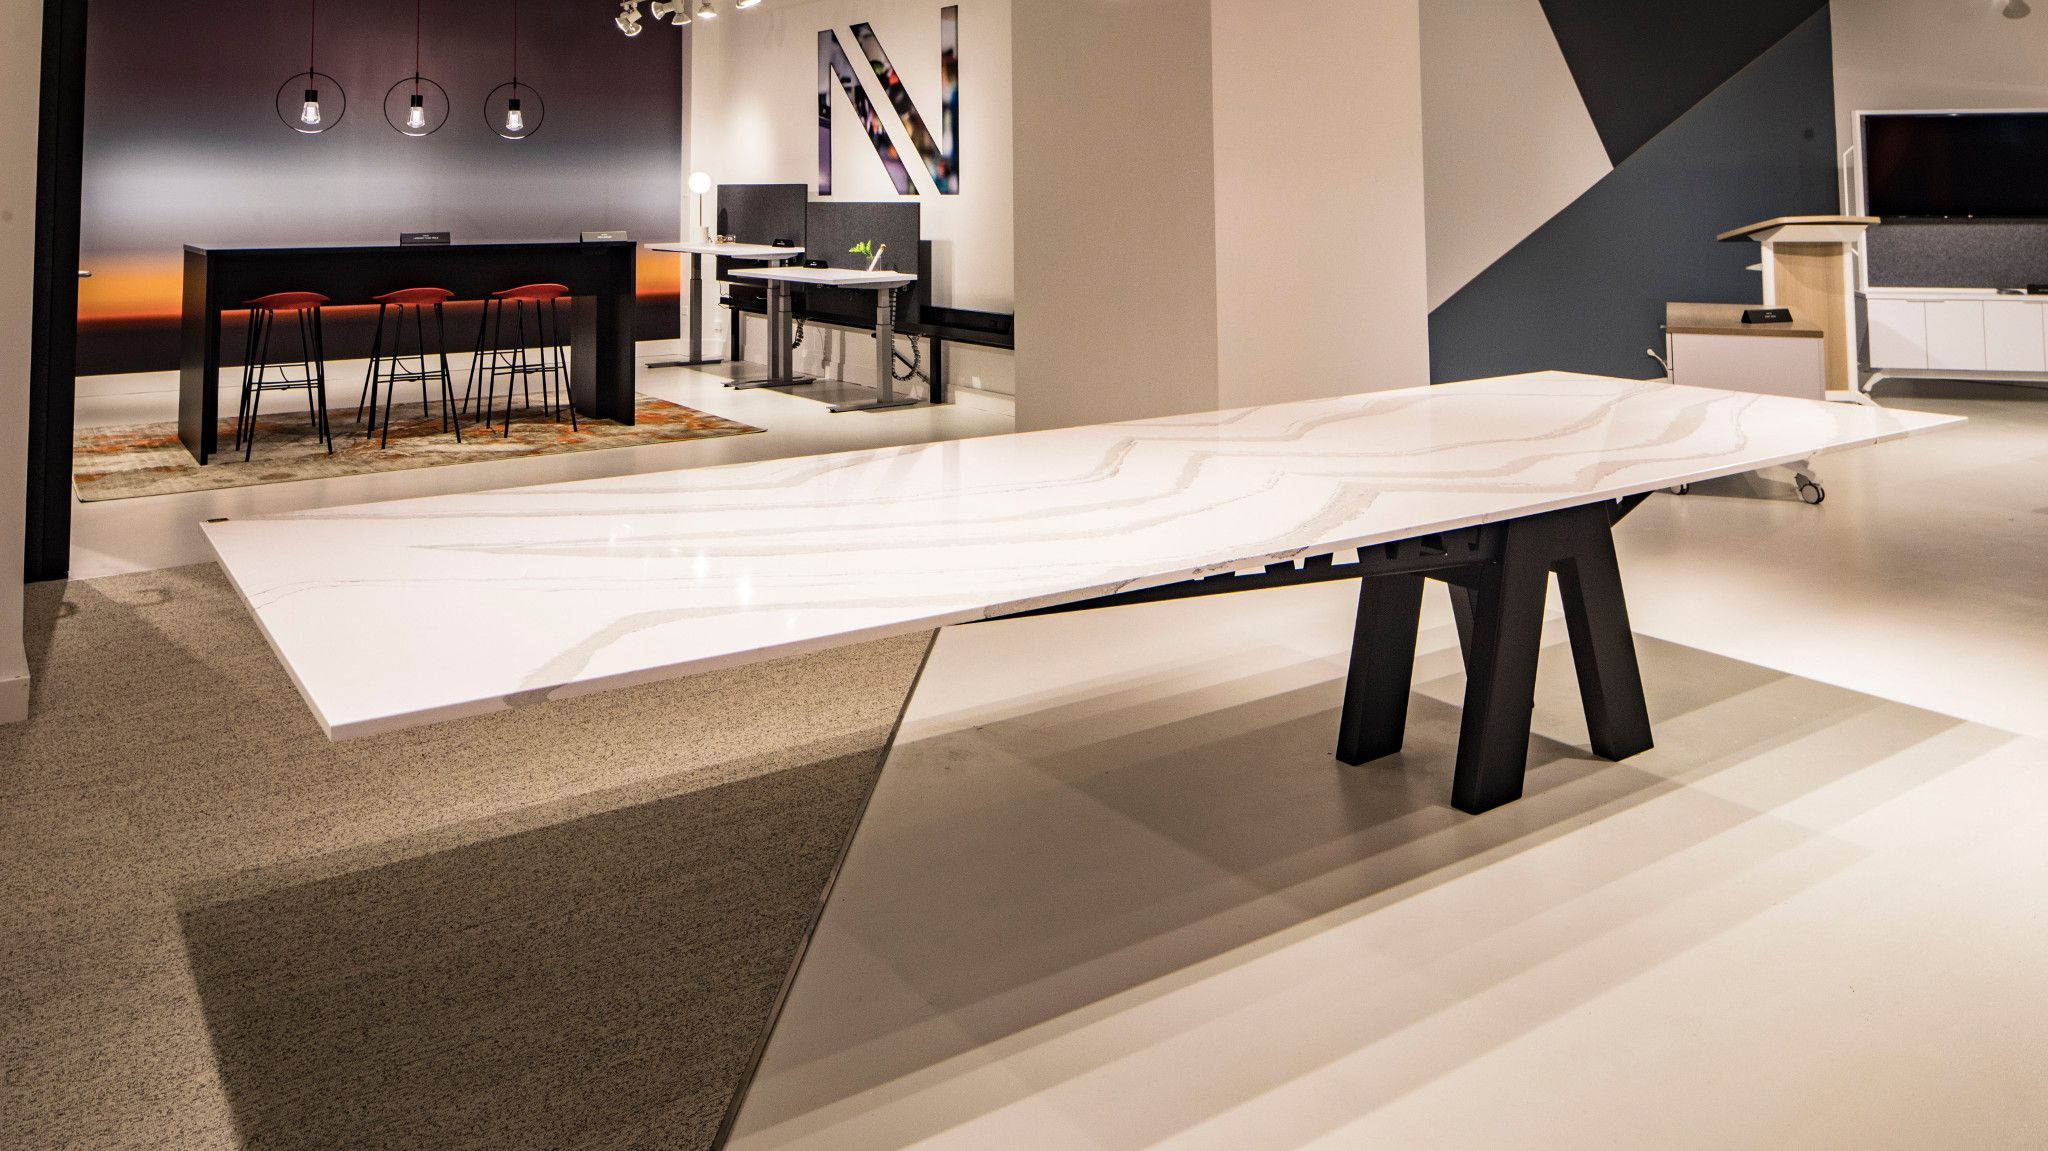 Enwork Neocon 2018 Commercial Design Design Trends Design